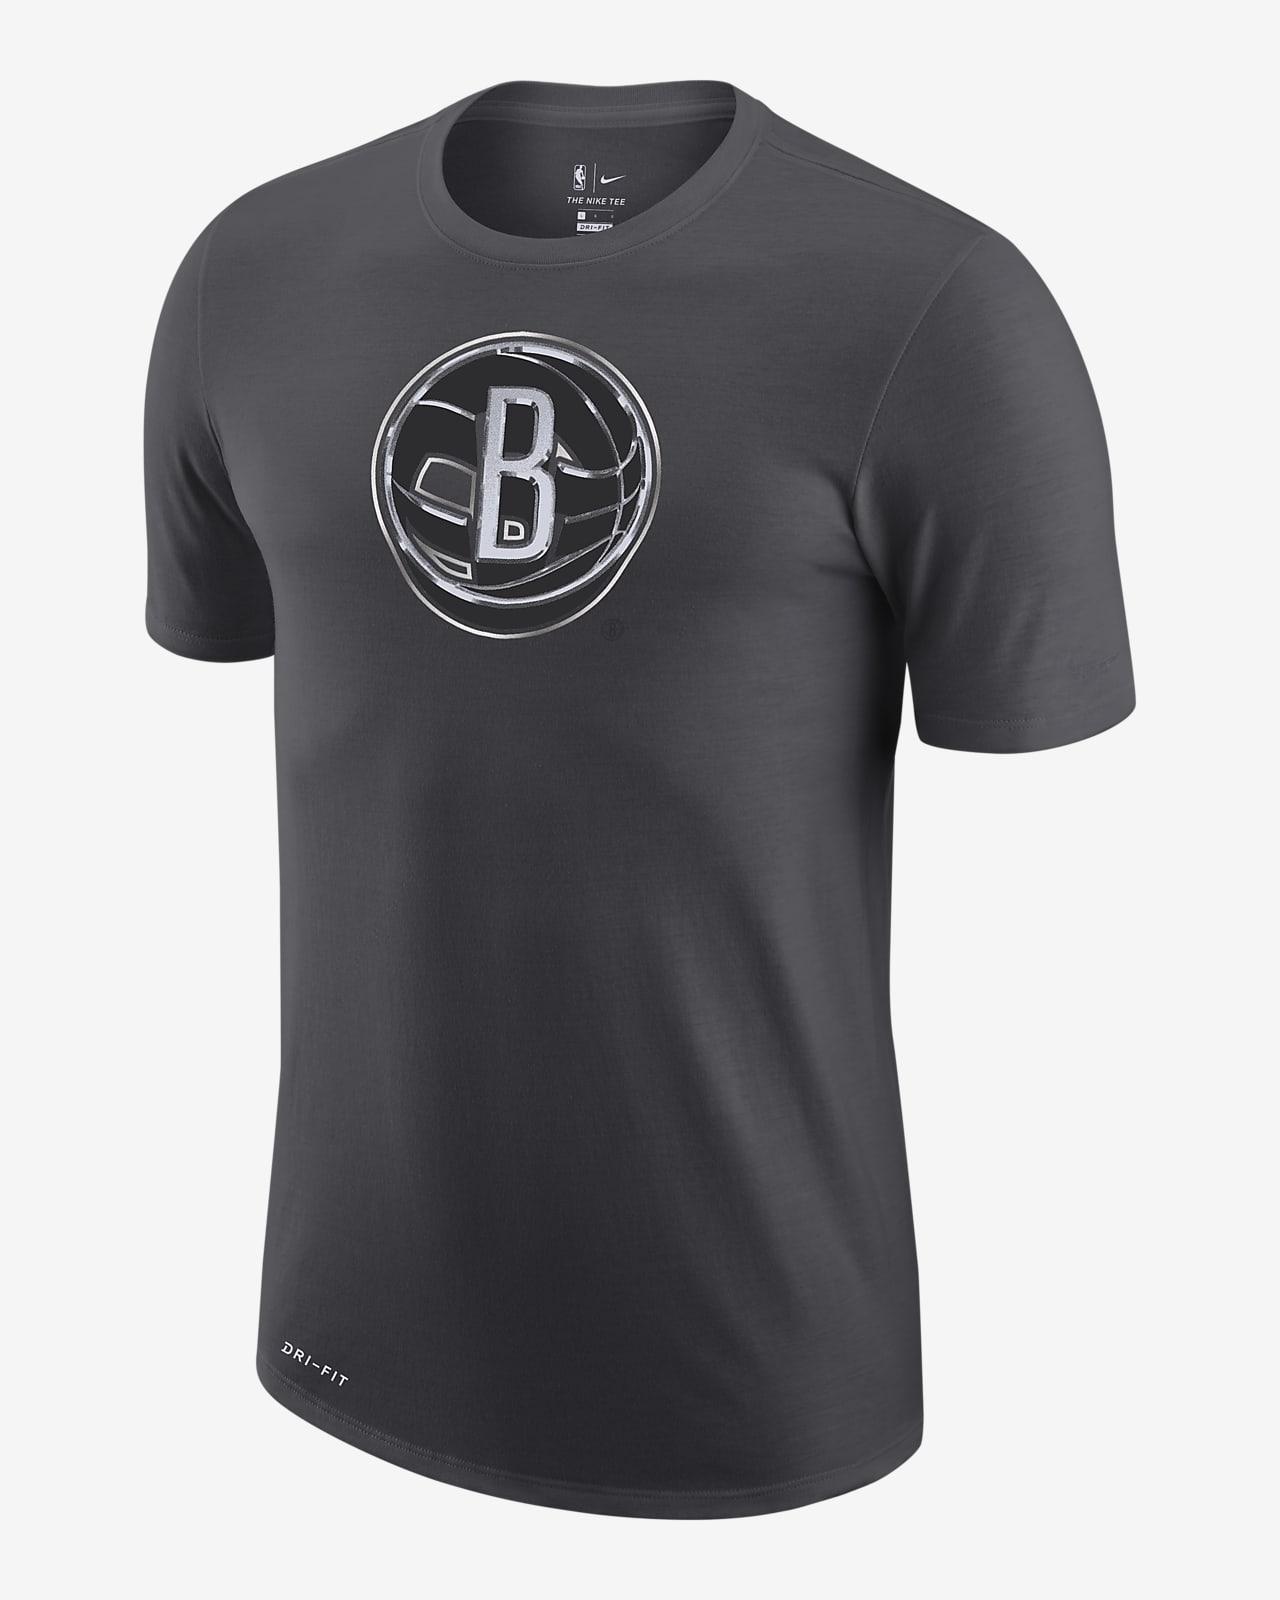 Playera con logotipo de la NBA Nike Dri-FIT para hombre Brooklyn Nets Earned Edition